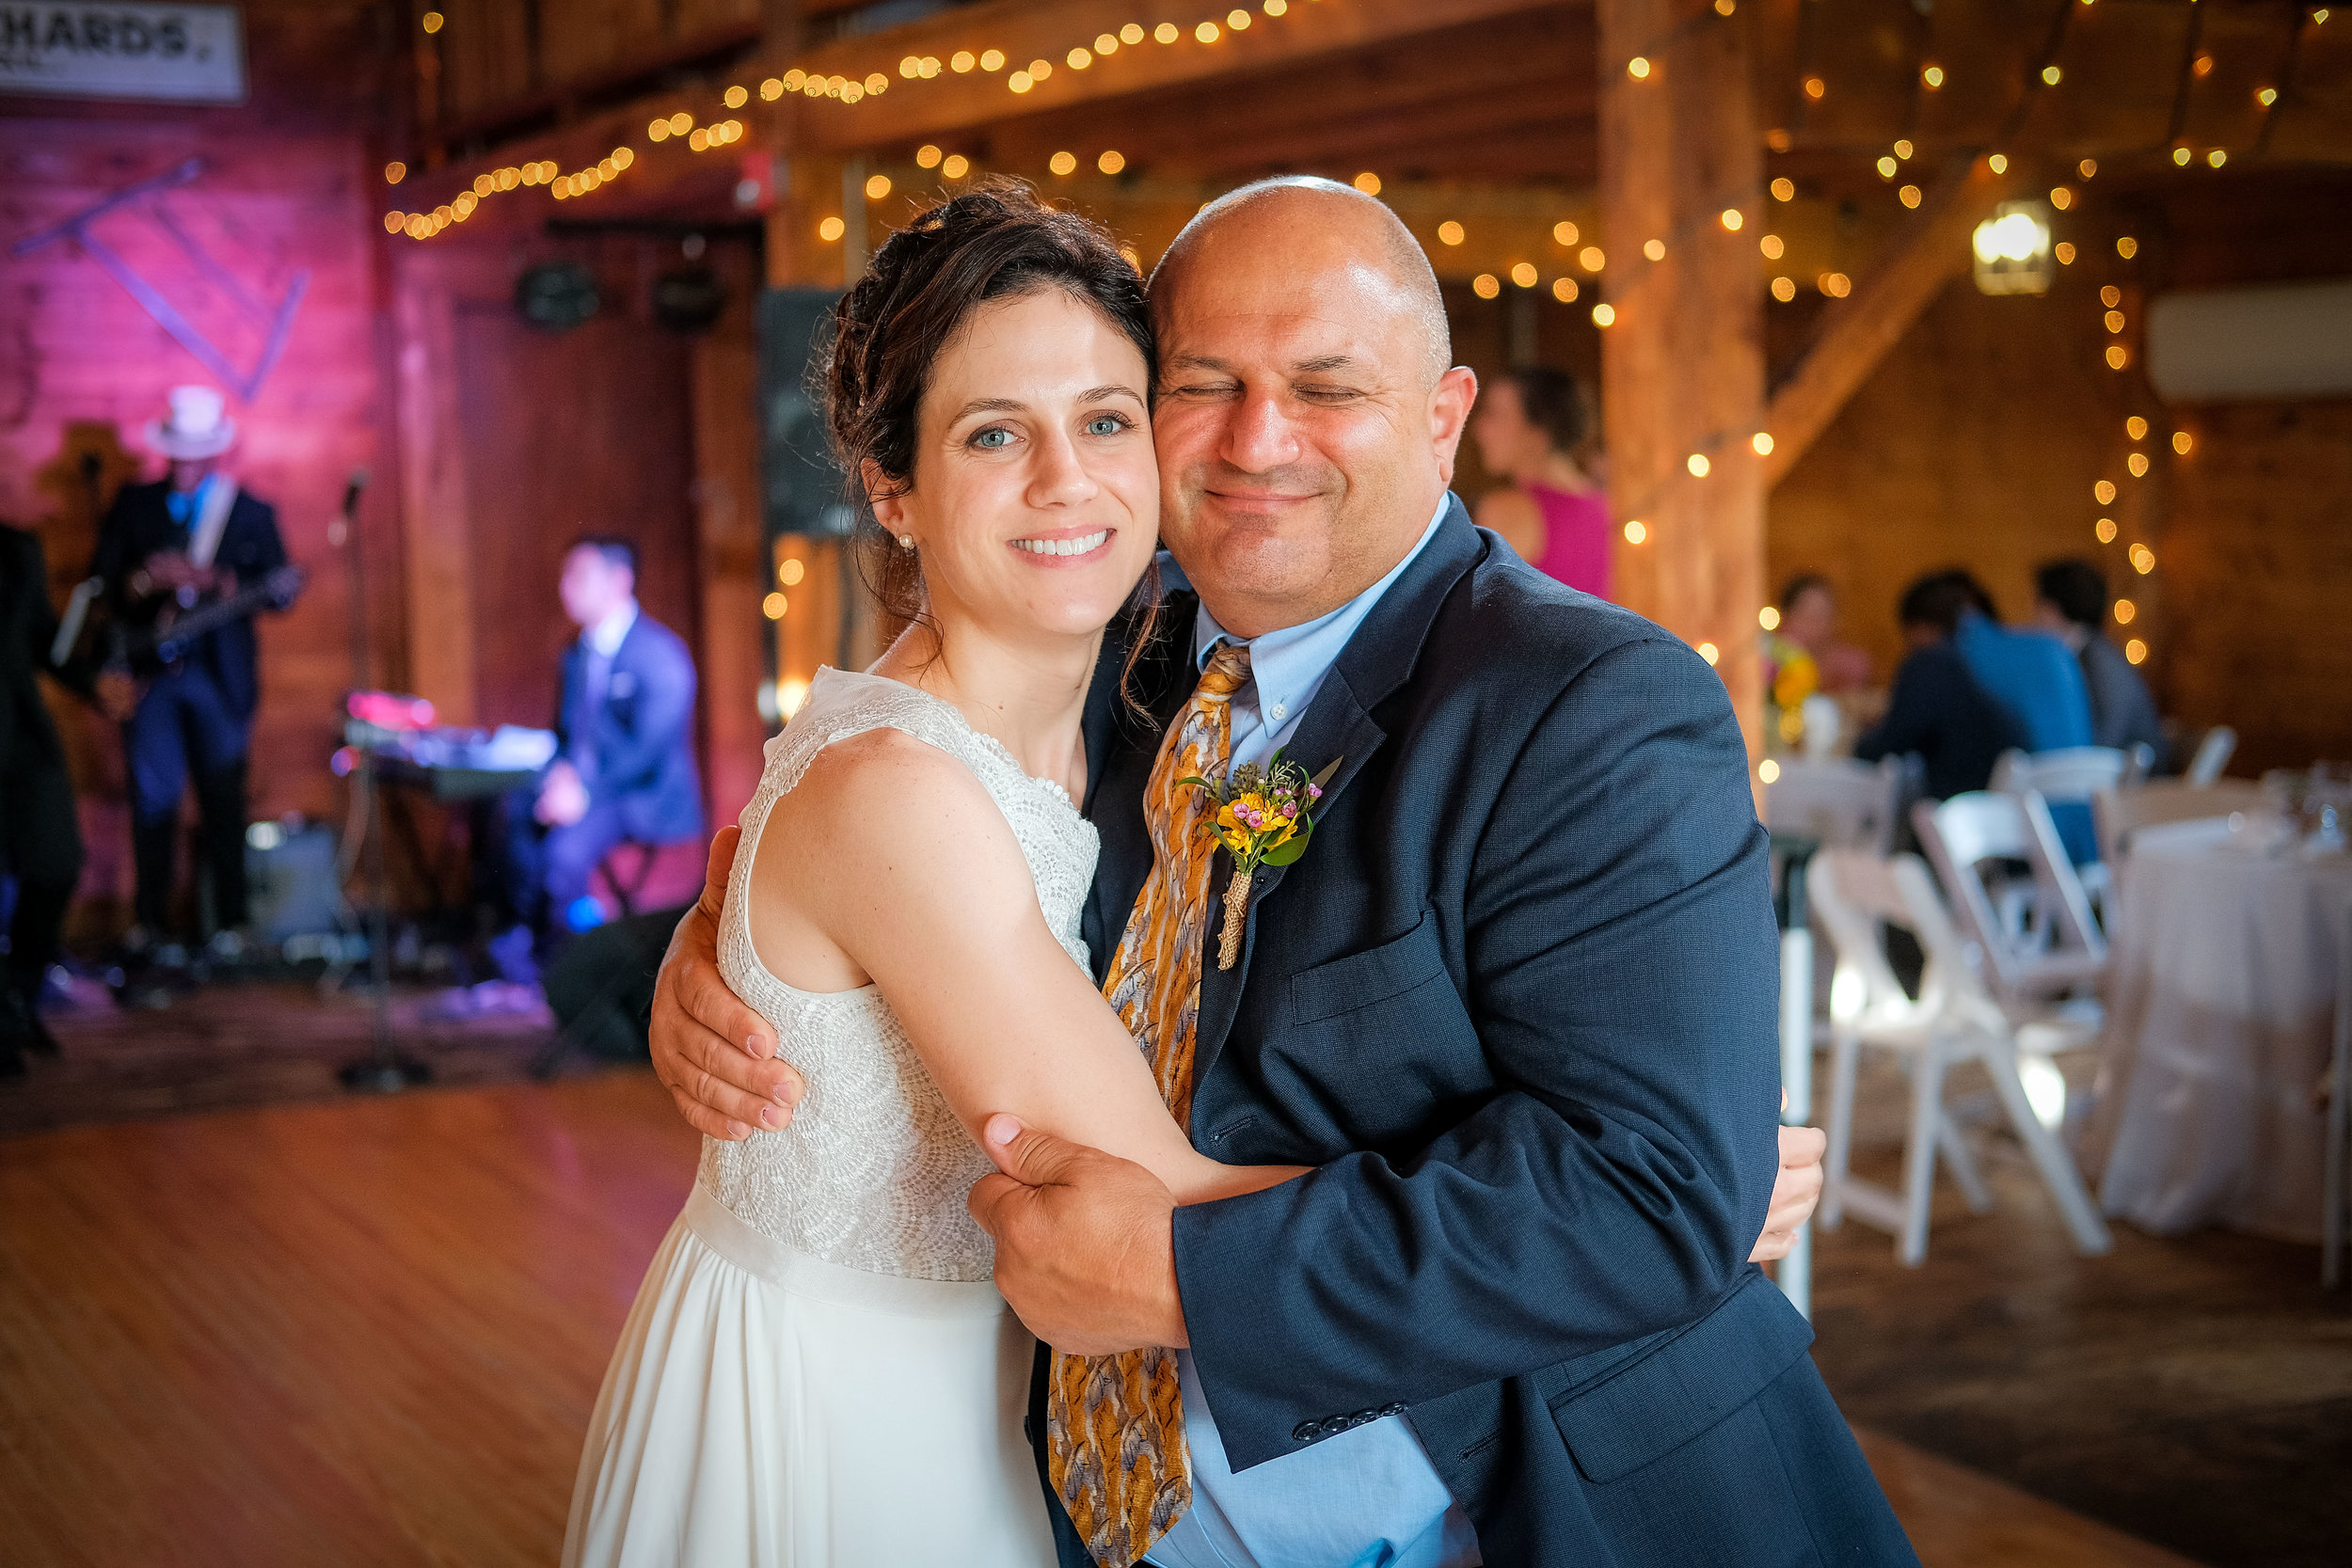 Peabody-Smith-Barn-Wedding-Photography-39.jpg